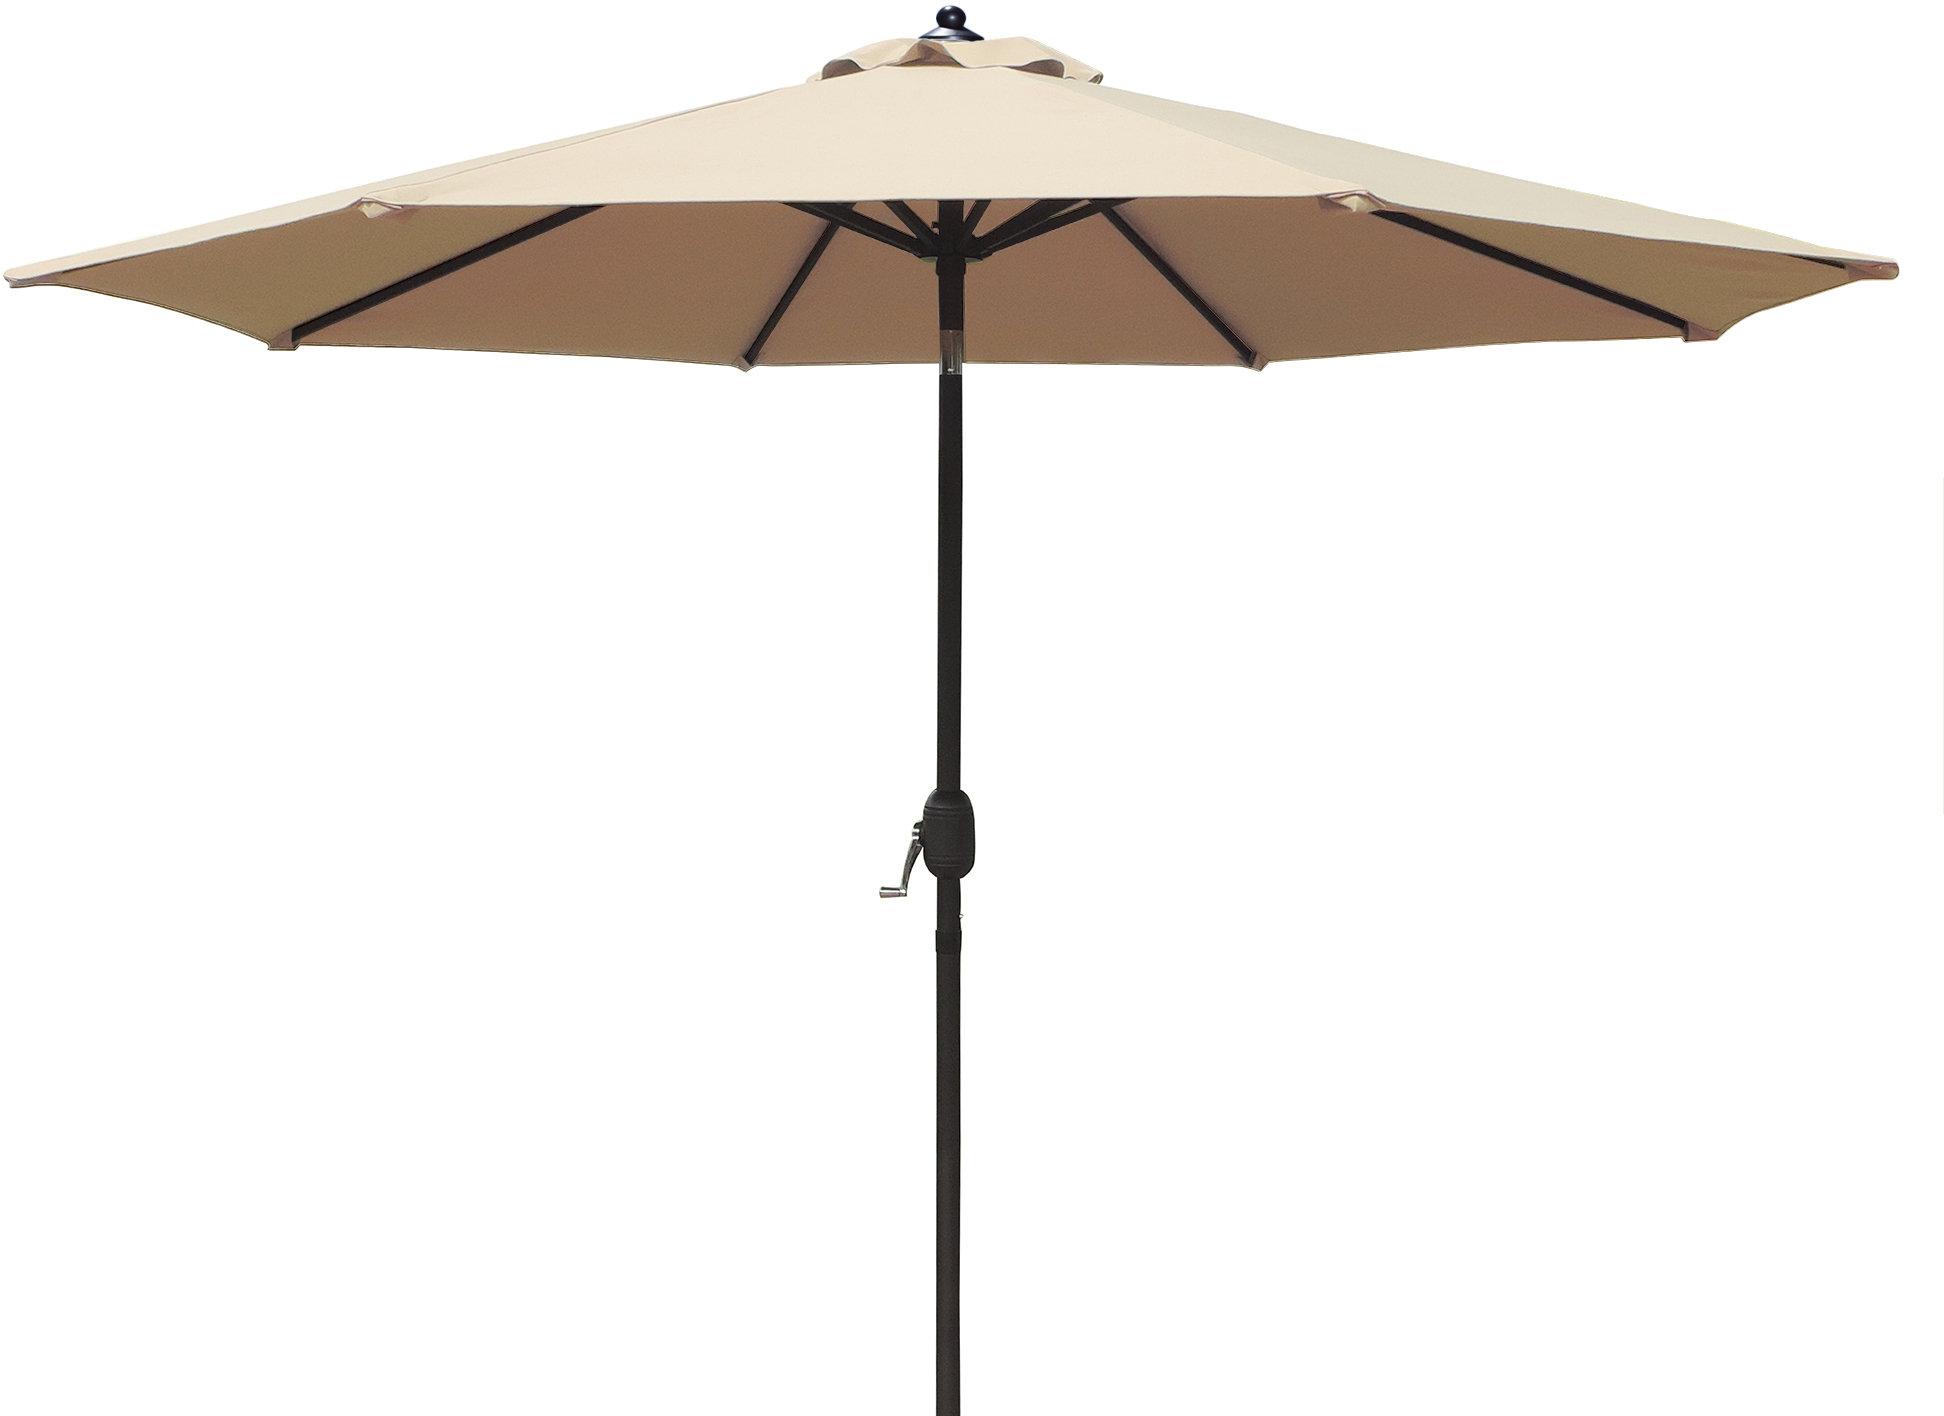 2019 9' Market Umbrella Within Cannock Market Umbrellas (View 2 of 20)